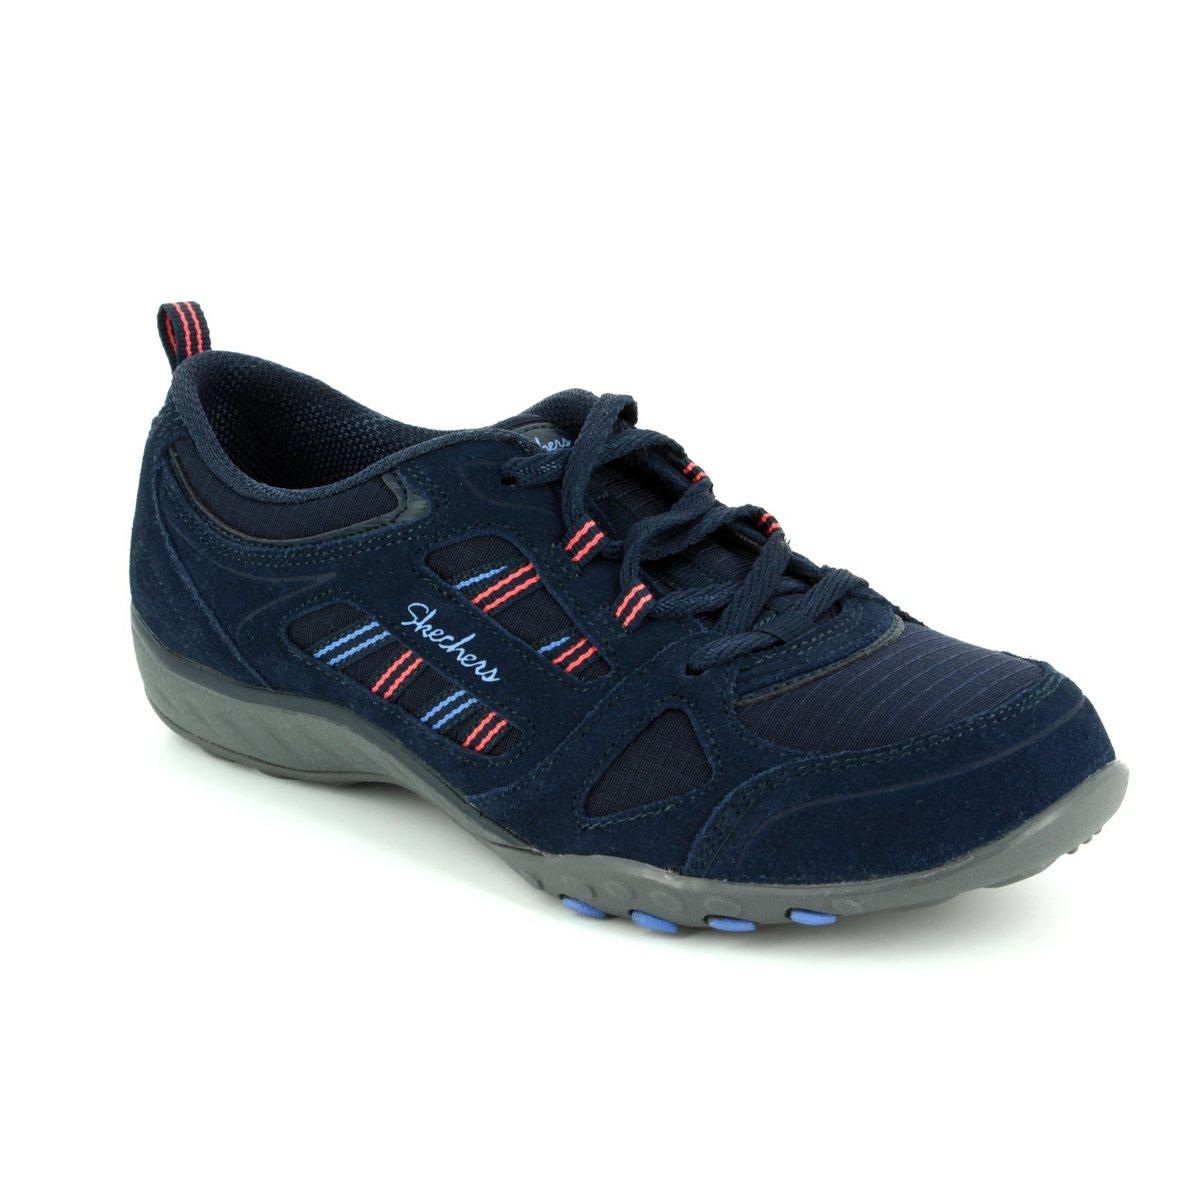 fbf9e0bd Skechers Lacing Shoes - Navy - 22544 GOOD LUCK